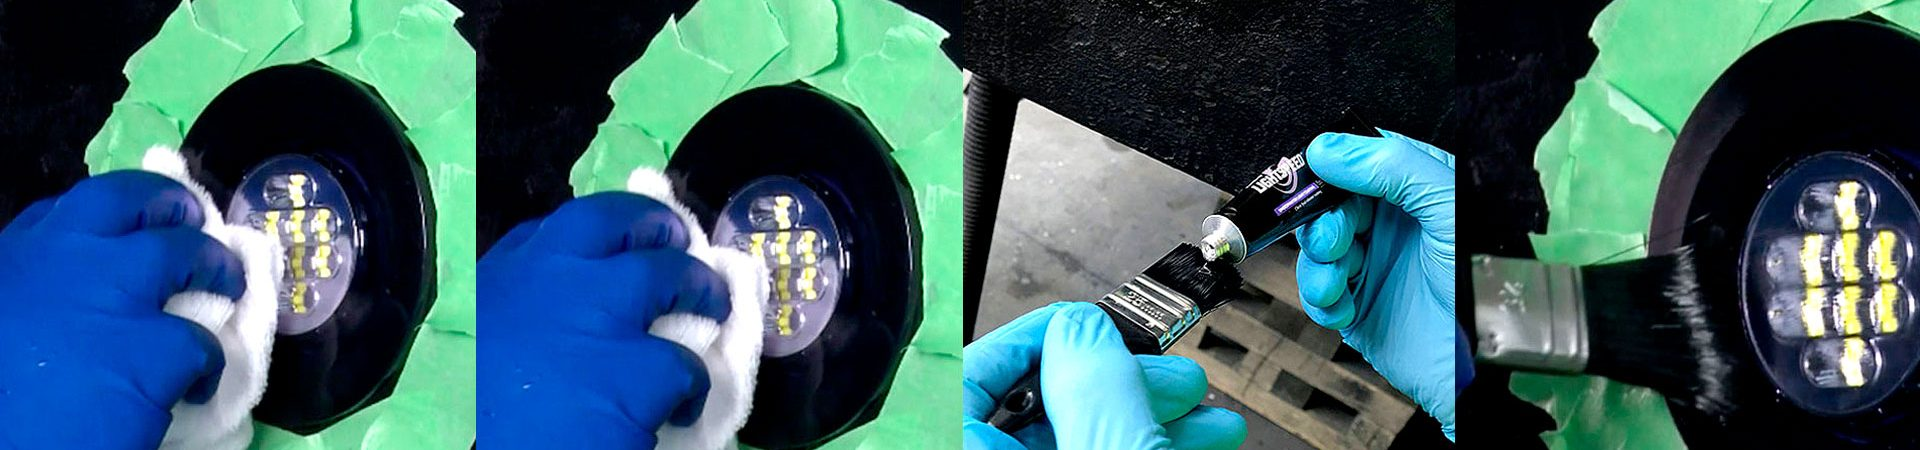 Lightspeed PropSpeed: Aplicación cambermarine